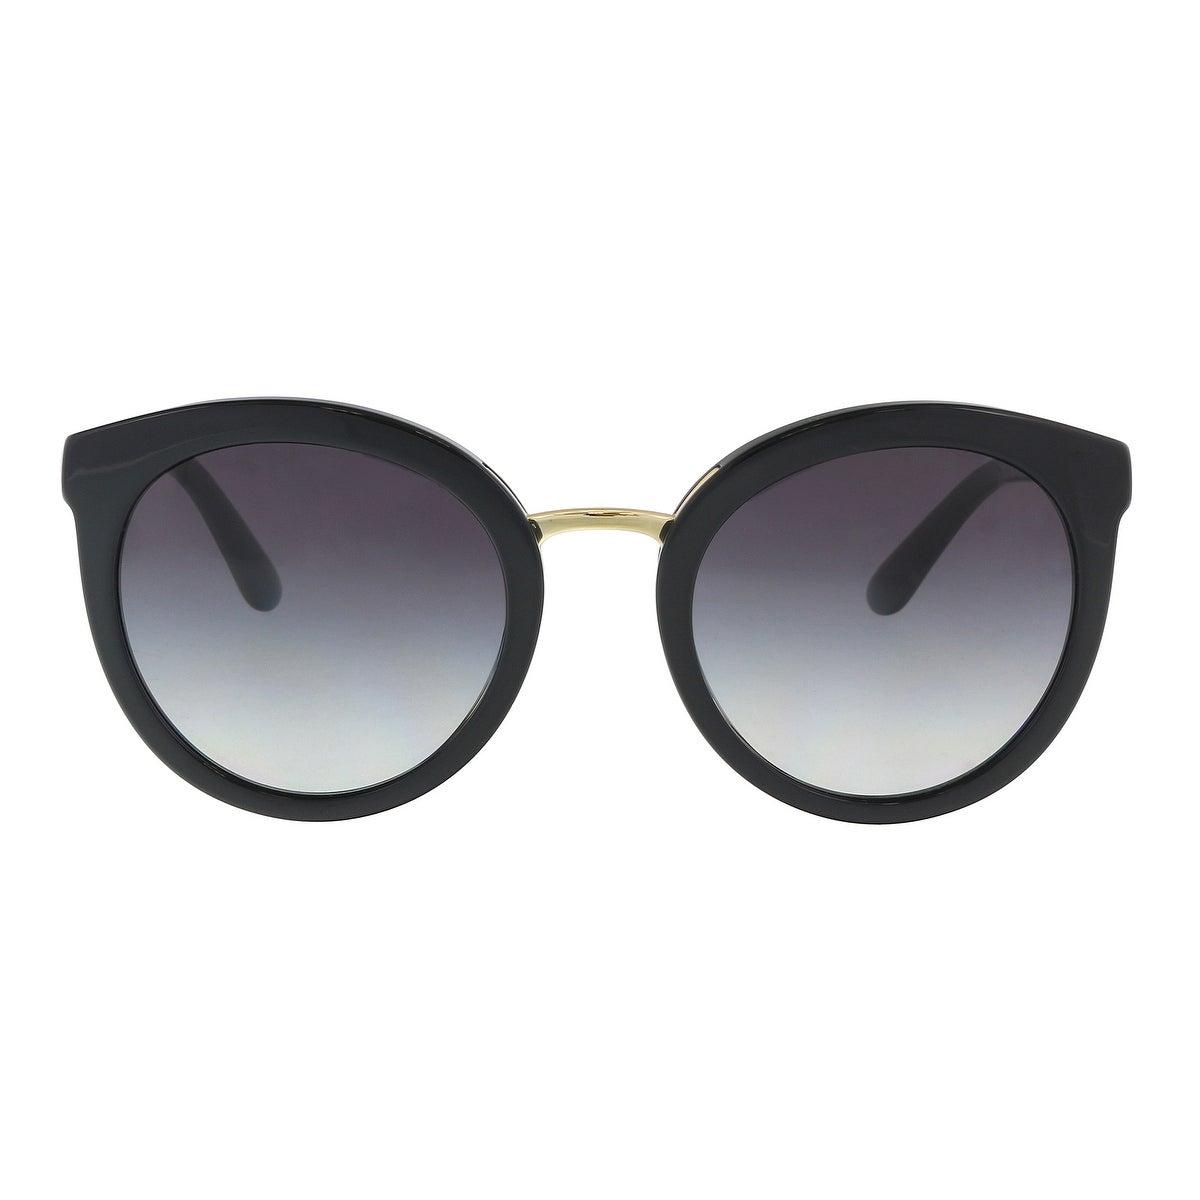 8df2eff6fa3 Shop Dolce   Gabbana DG4268 501 8G Black Cat Eye Sunglasses - 52-22-140 -  On Sale - Free Shipping Today - Overstock - 21158291